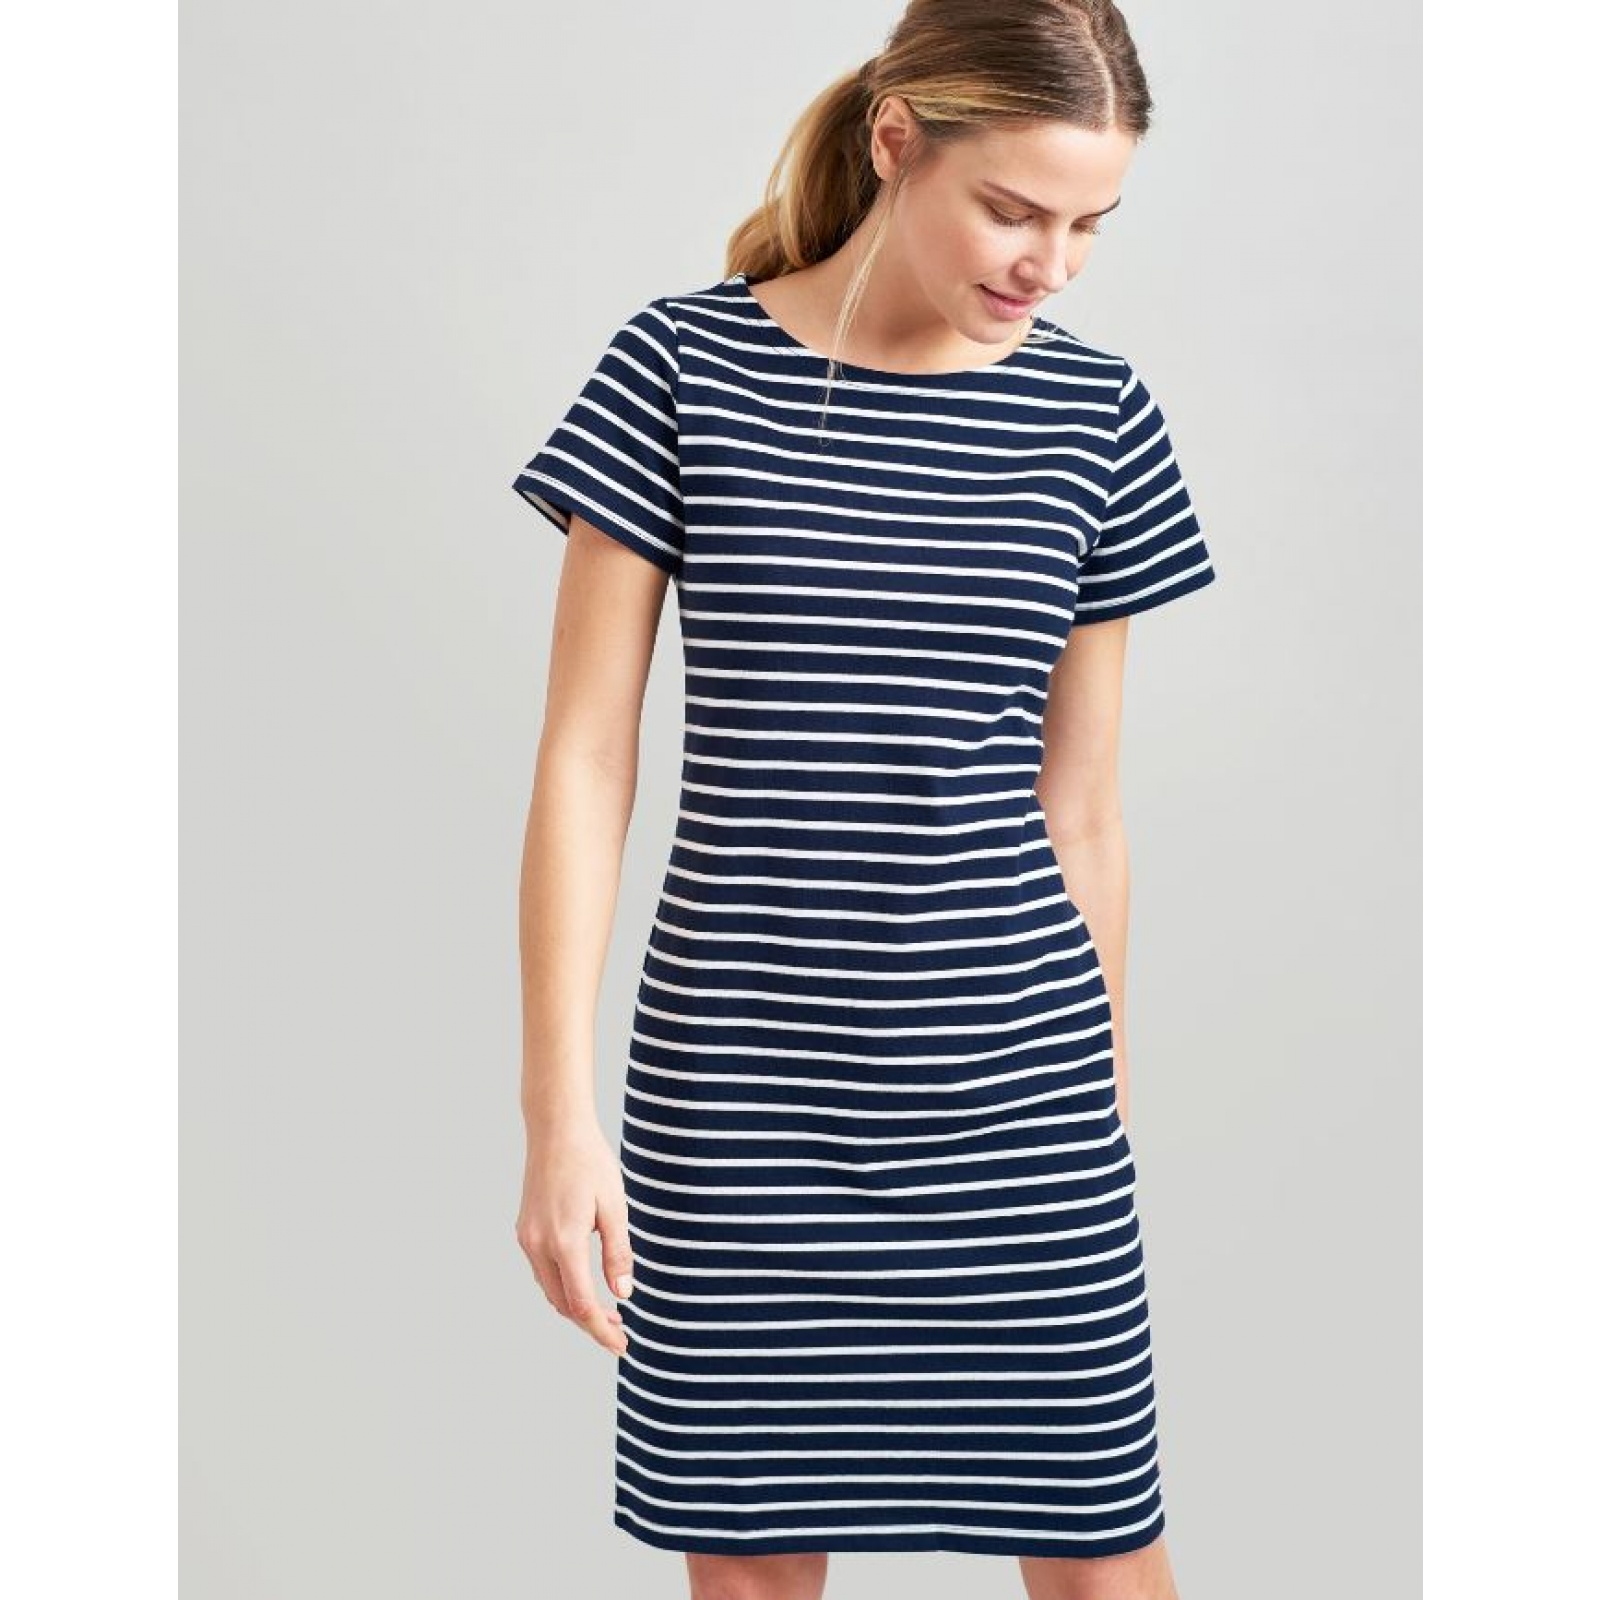 Joules Riviera Long Short Sleeve Jersey SS19